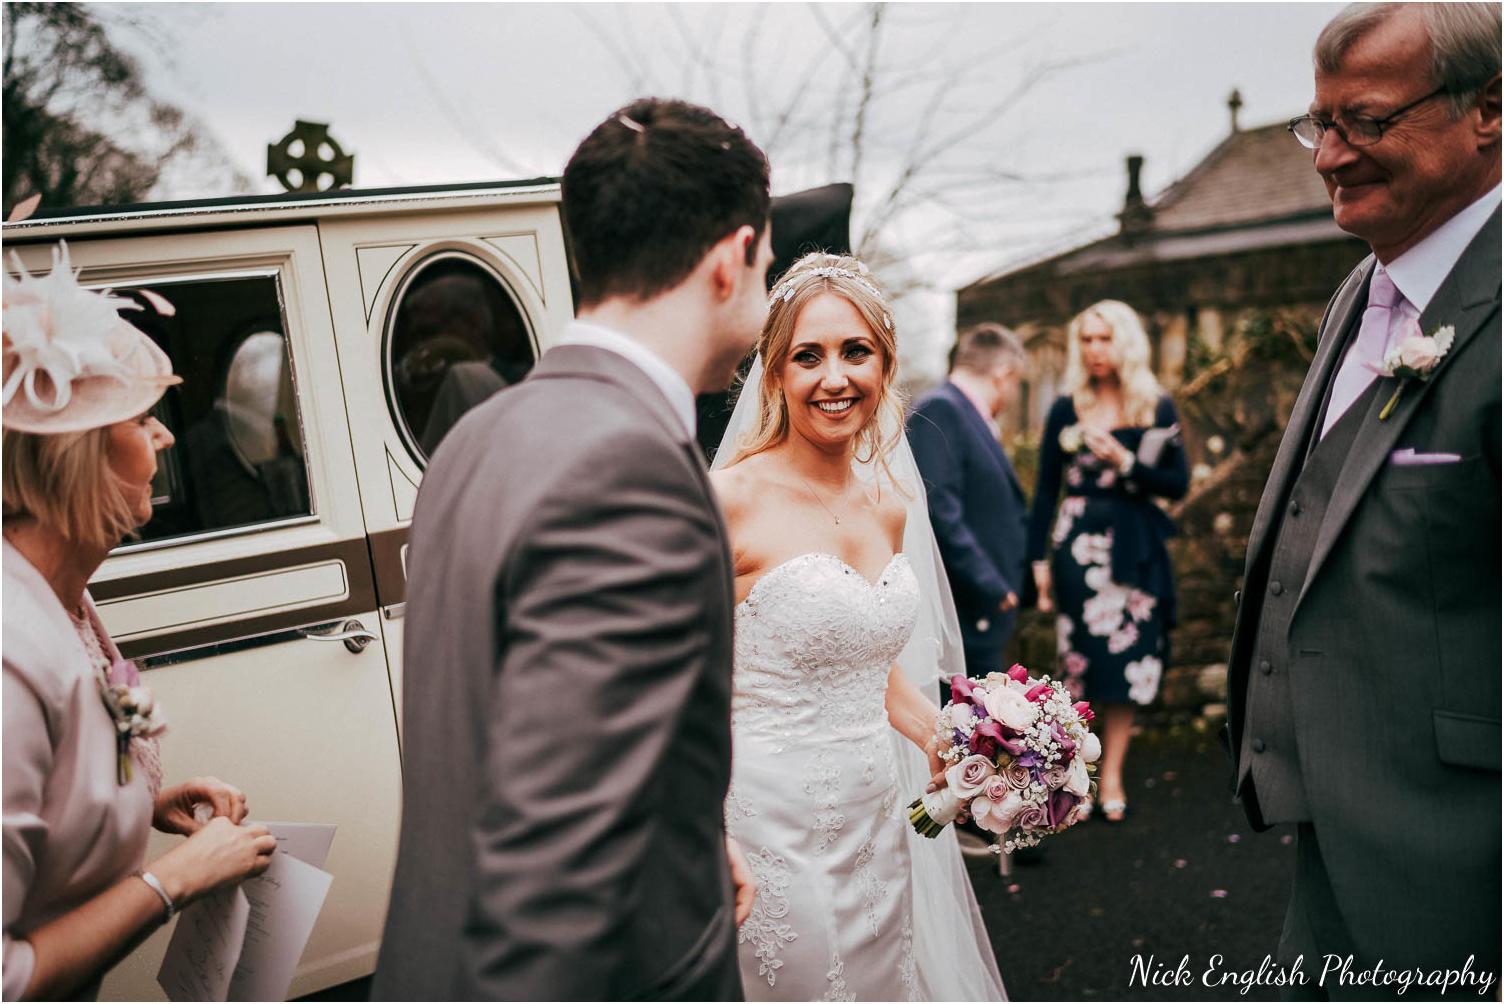 Mitton_Hall_Wedding_Photographer_2018-88.jpg